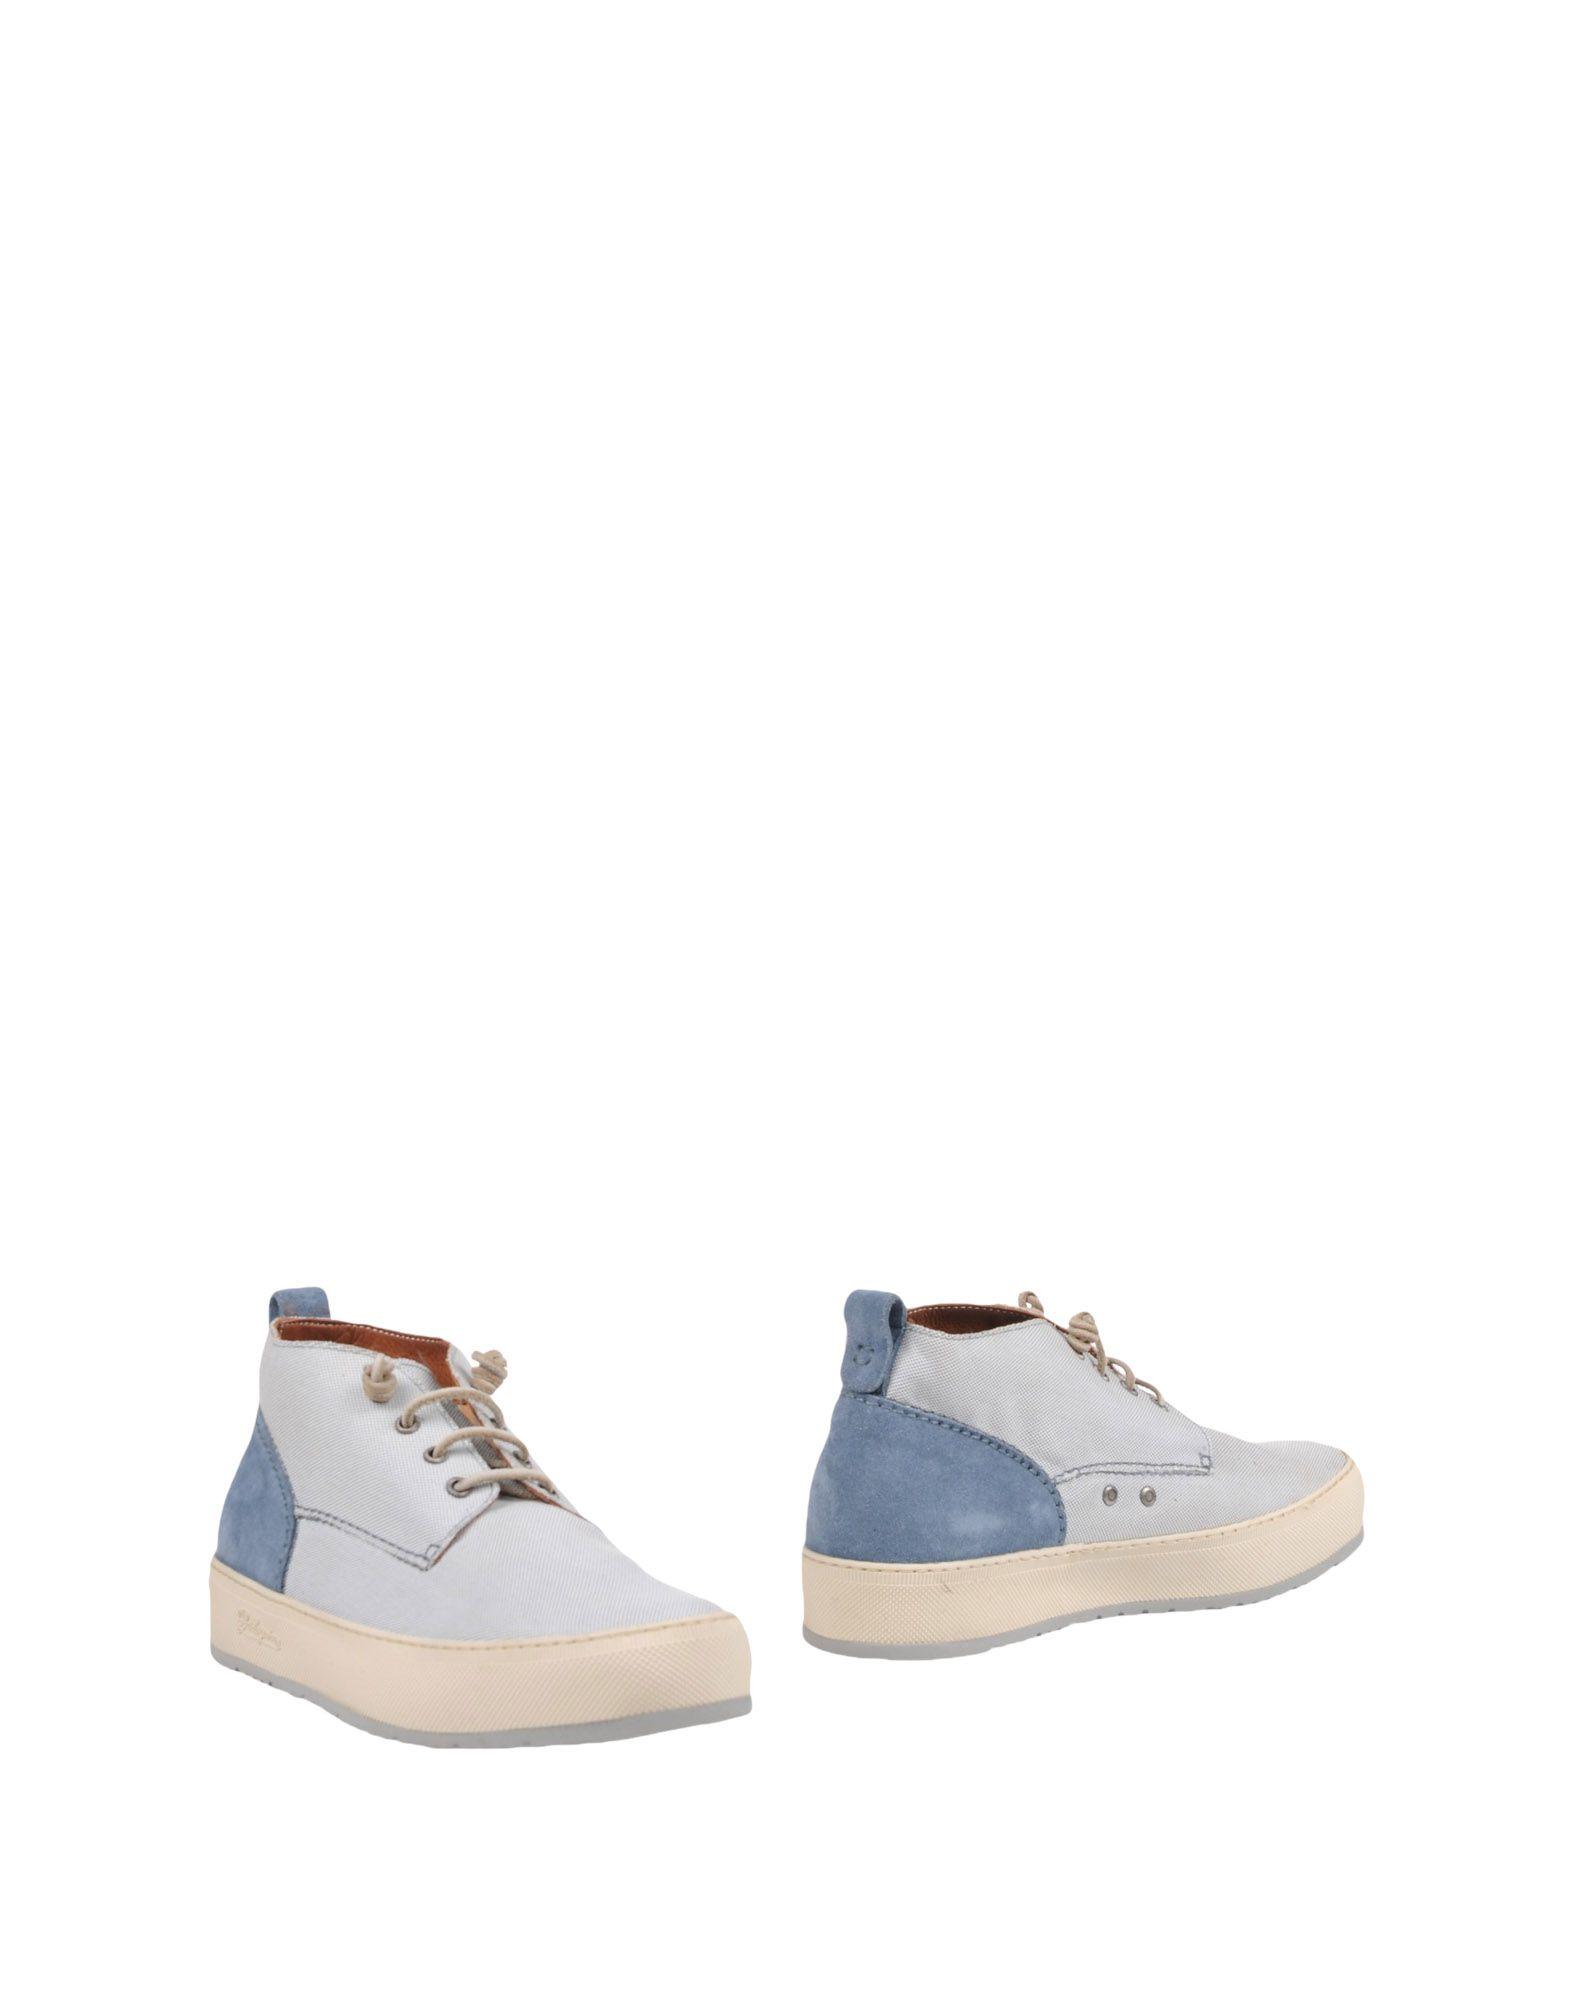 Rabatt echte Schuhe Barleycorn Stiefelette Herren  11443915MO